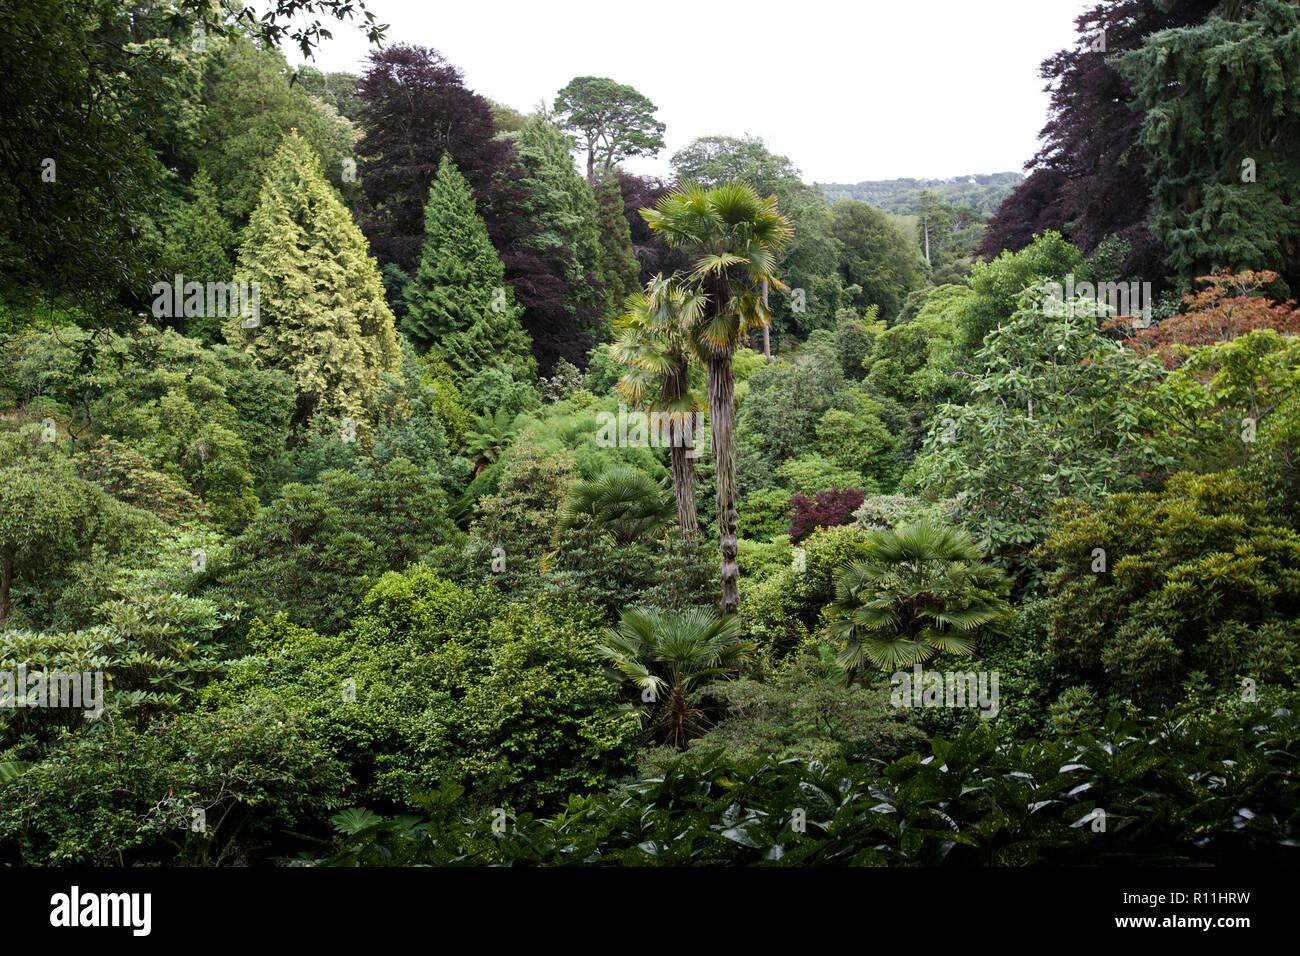 garden nature with beautiful foliage - Stock Image